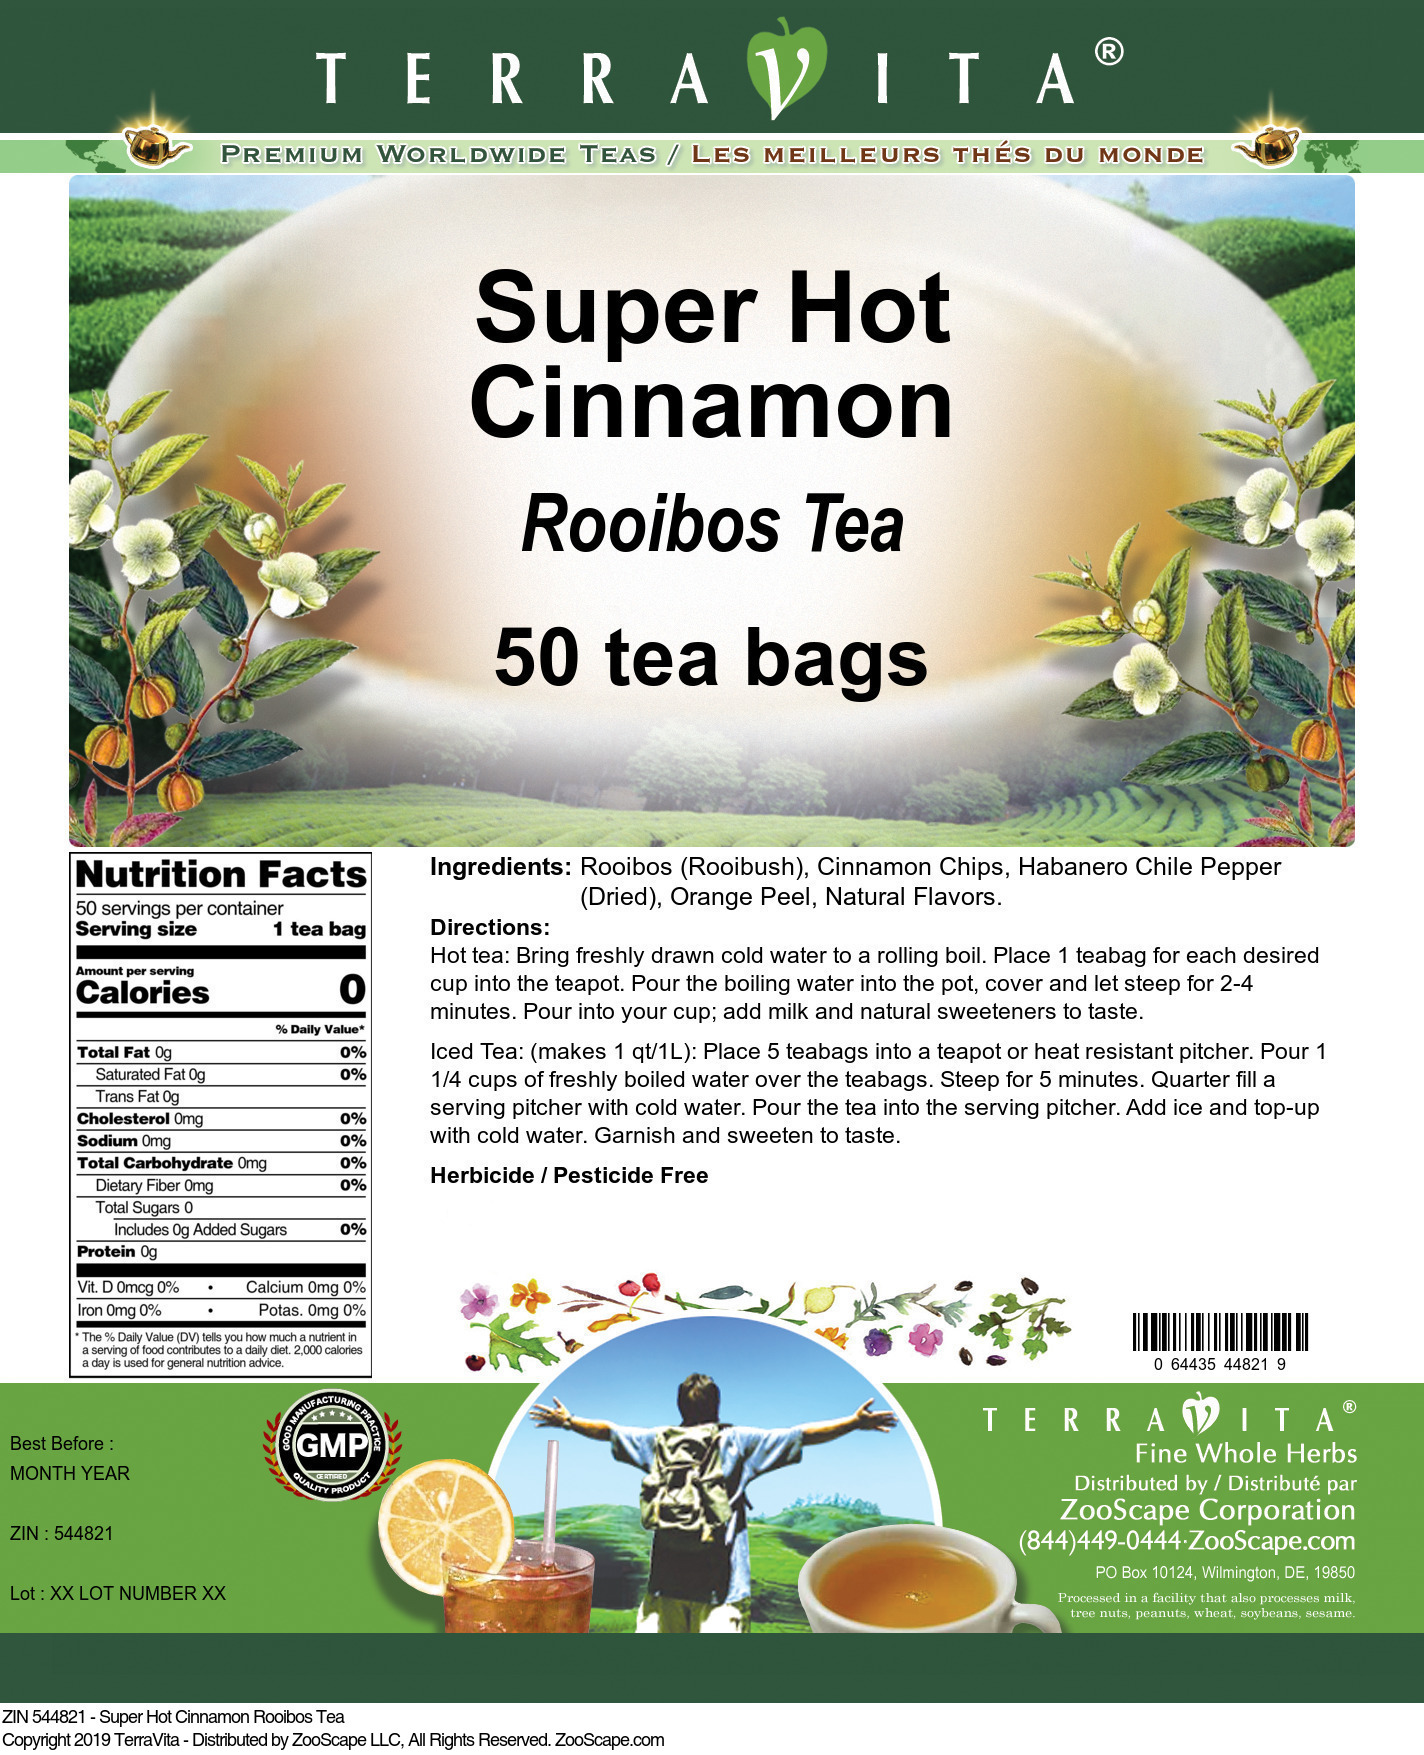 Super Hot Cinnamon Rooibos Tea